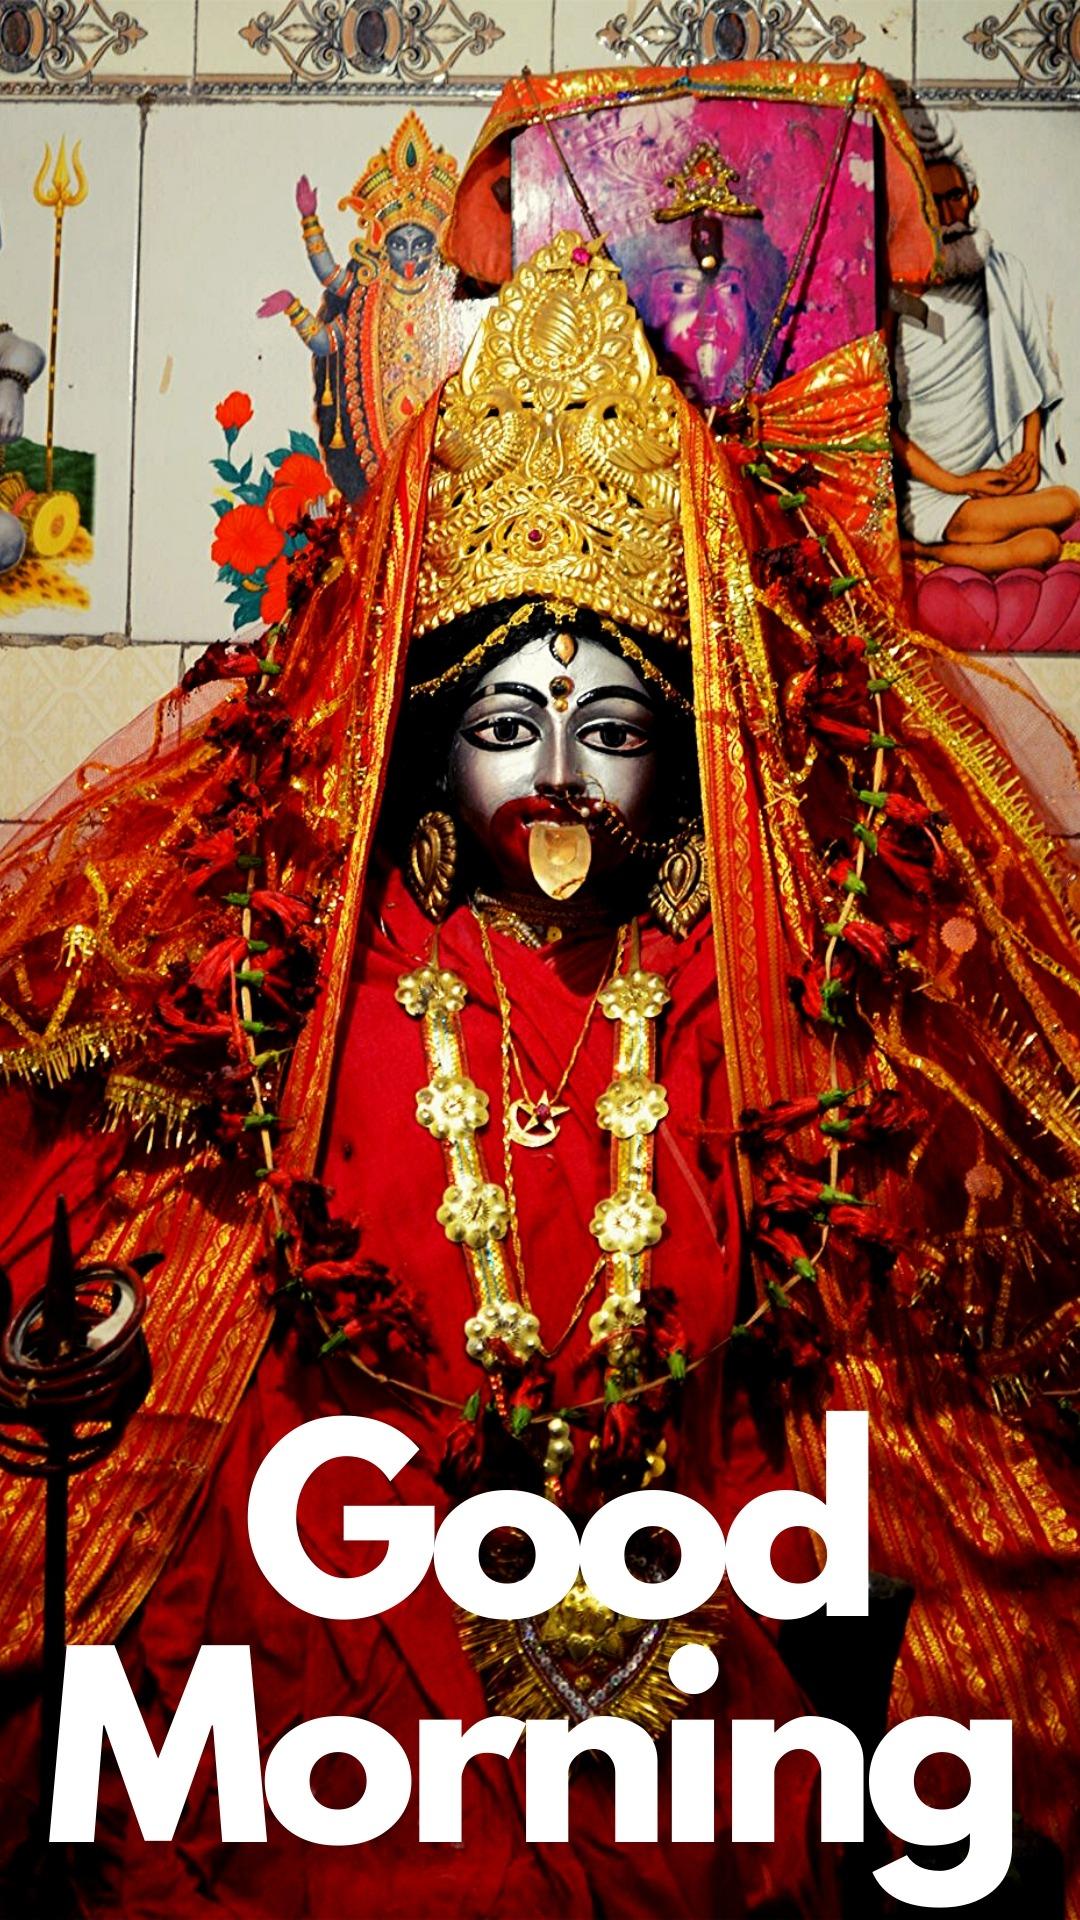 good morning with kali puja image